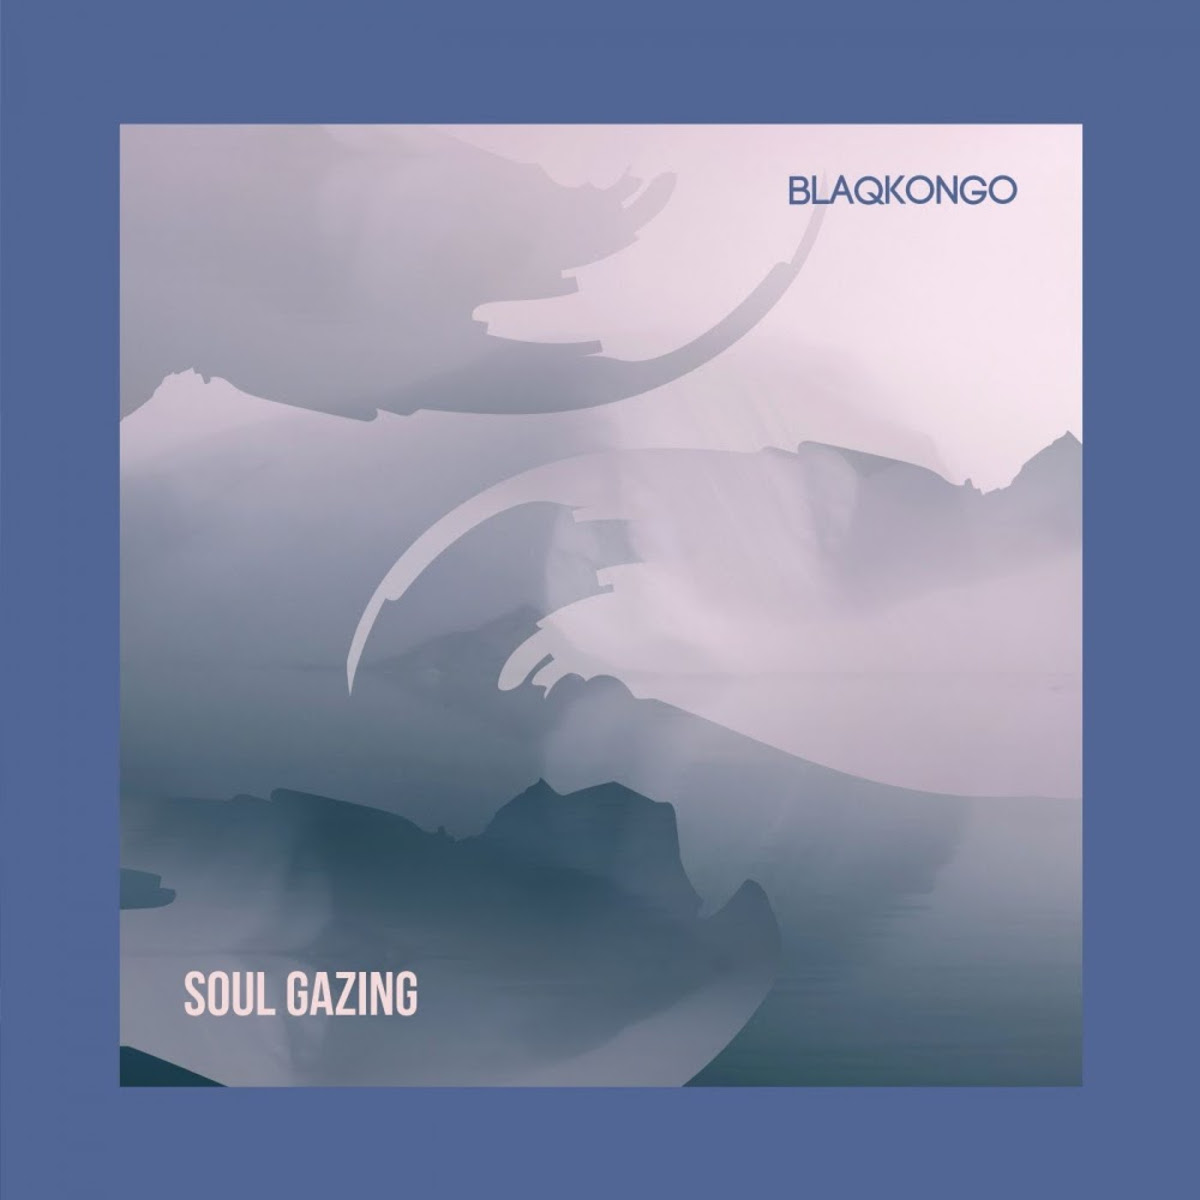 blaqkongo Soul Gazing - Blaqkongo – Soul Gazing